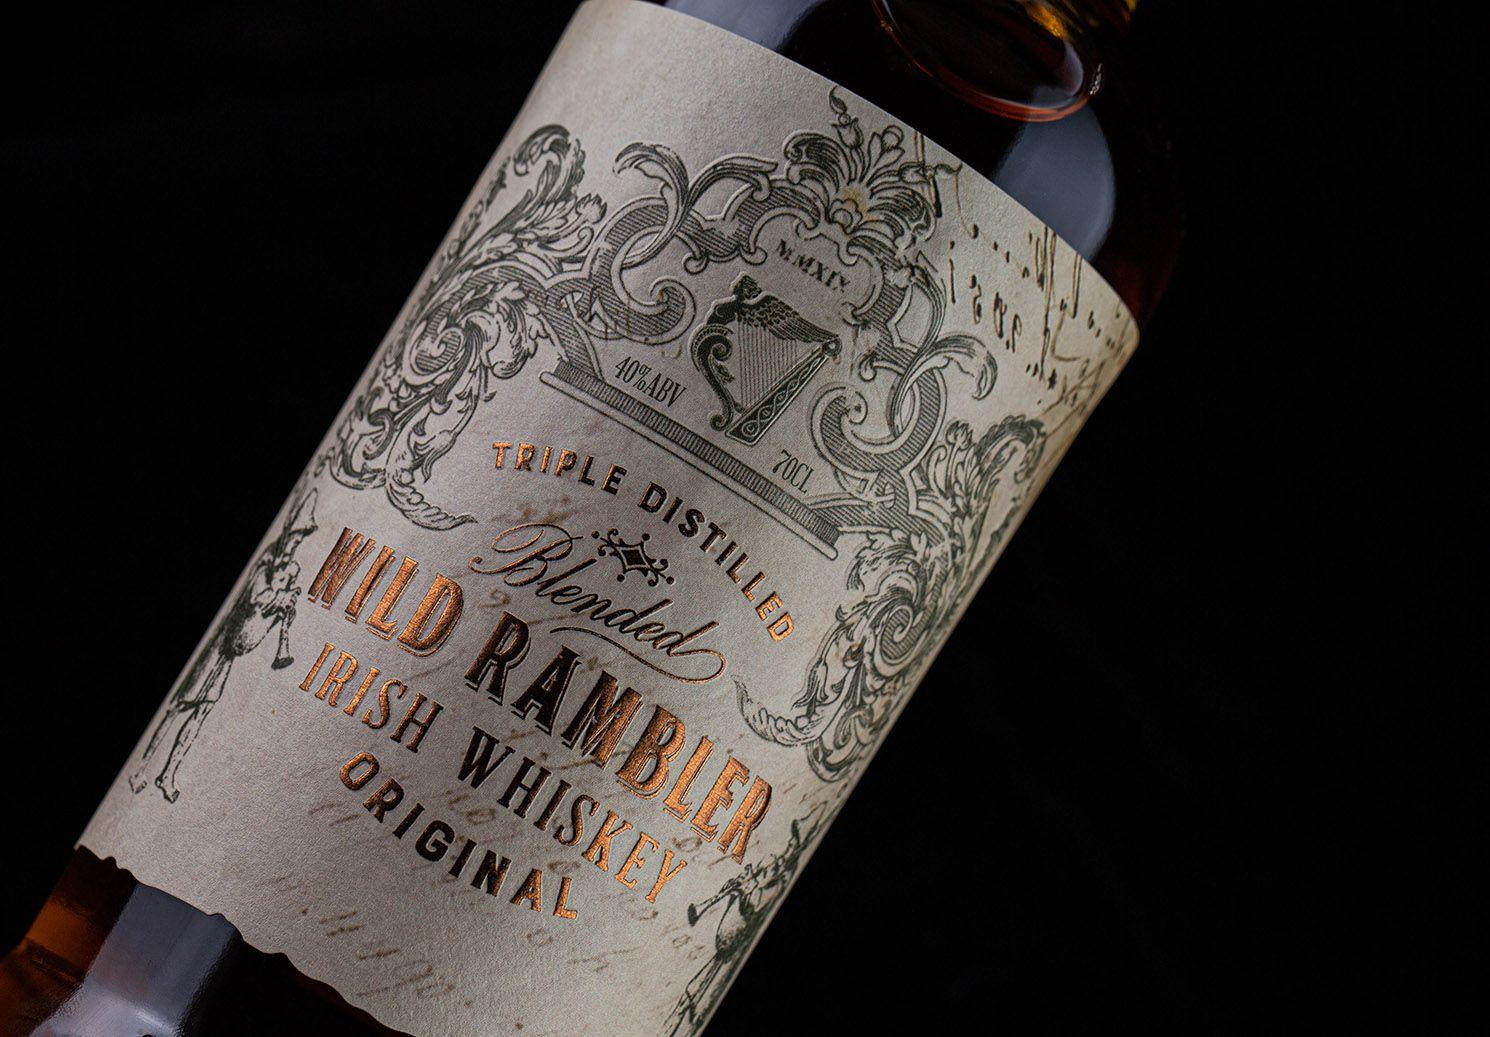 Thinkboldstudio Wild Rambler World Brand Design Society Triple Distilled And Non Chill Filtered W In 2020 Irish Whiskey Whiskey Packaging Irish Whiskey Brands